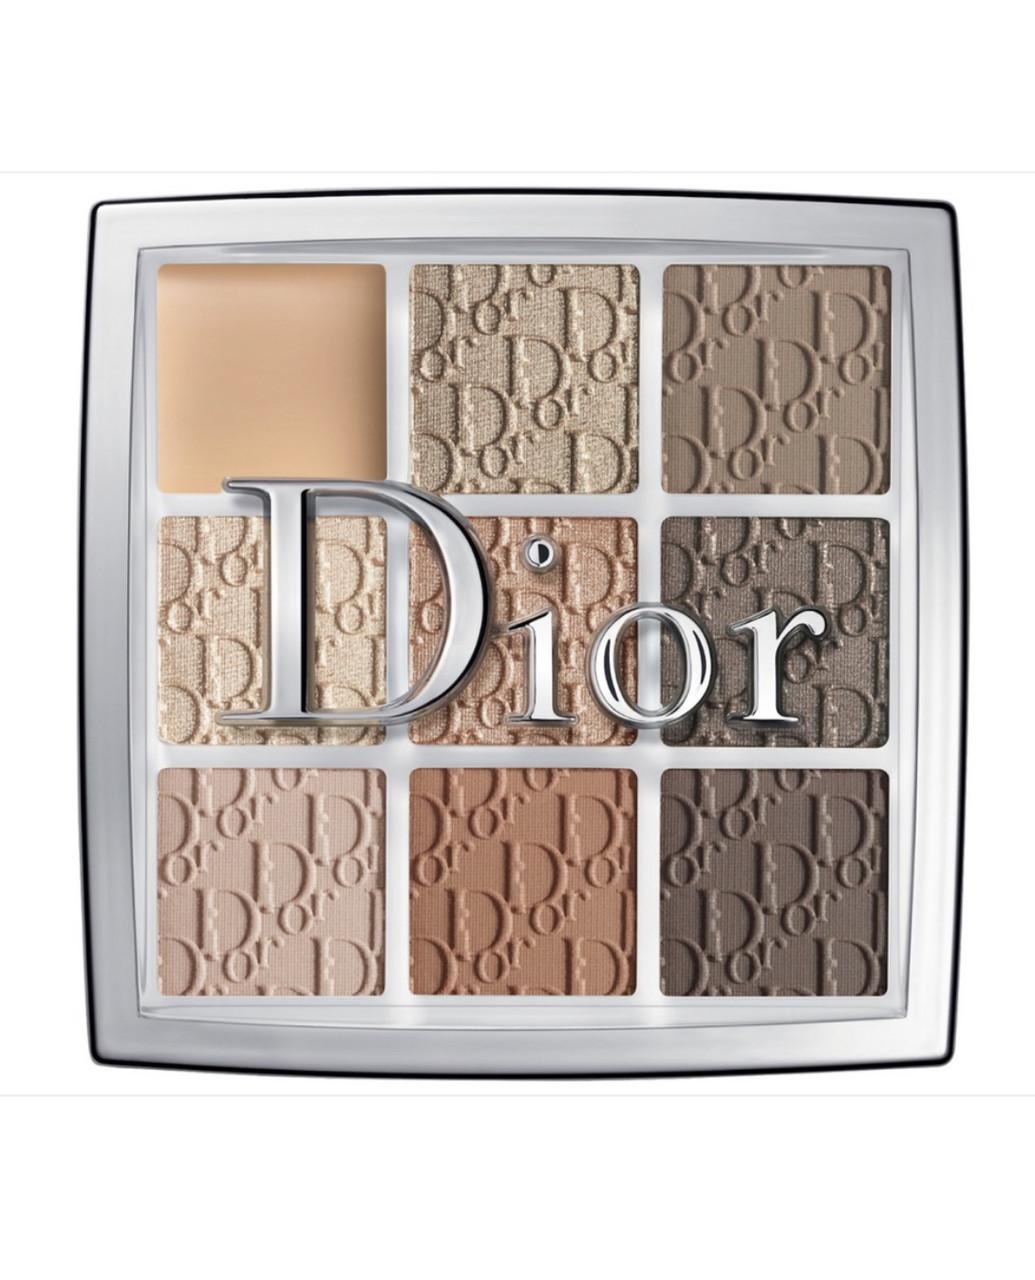 Палетка теней Dior BACKSTAGE Eyeshadow Palette - 001 WARM